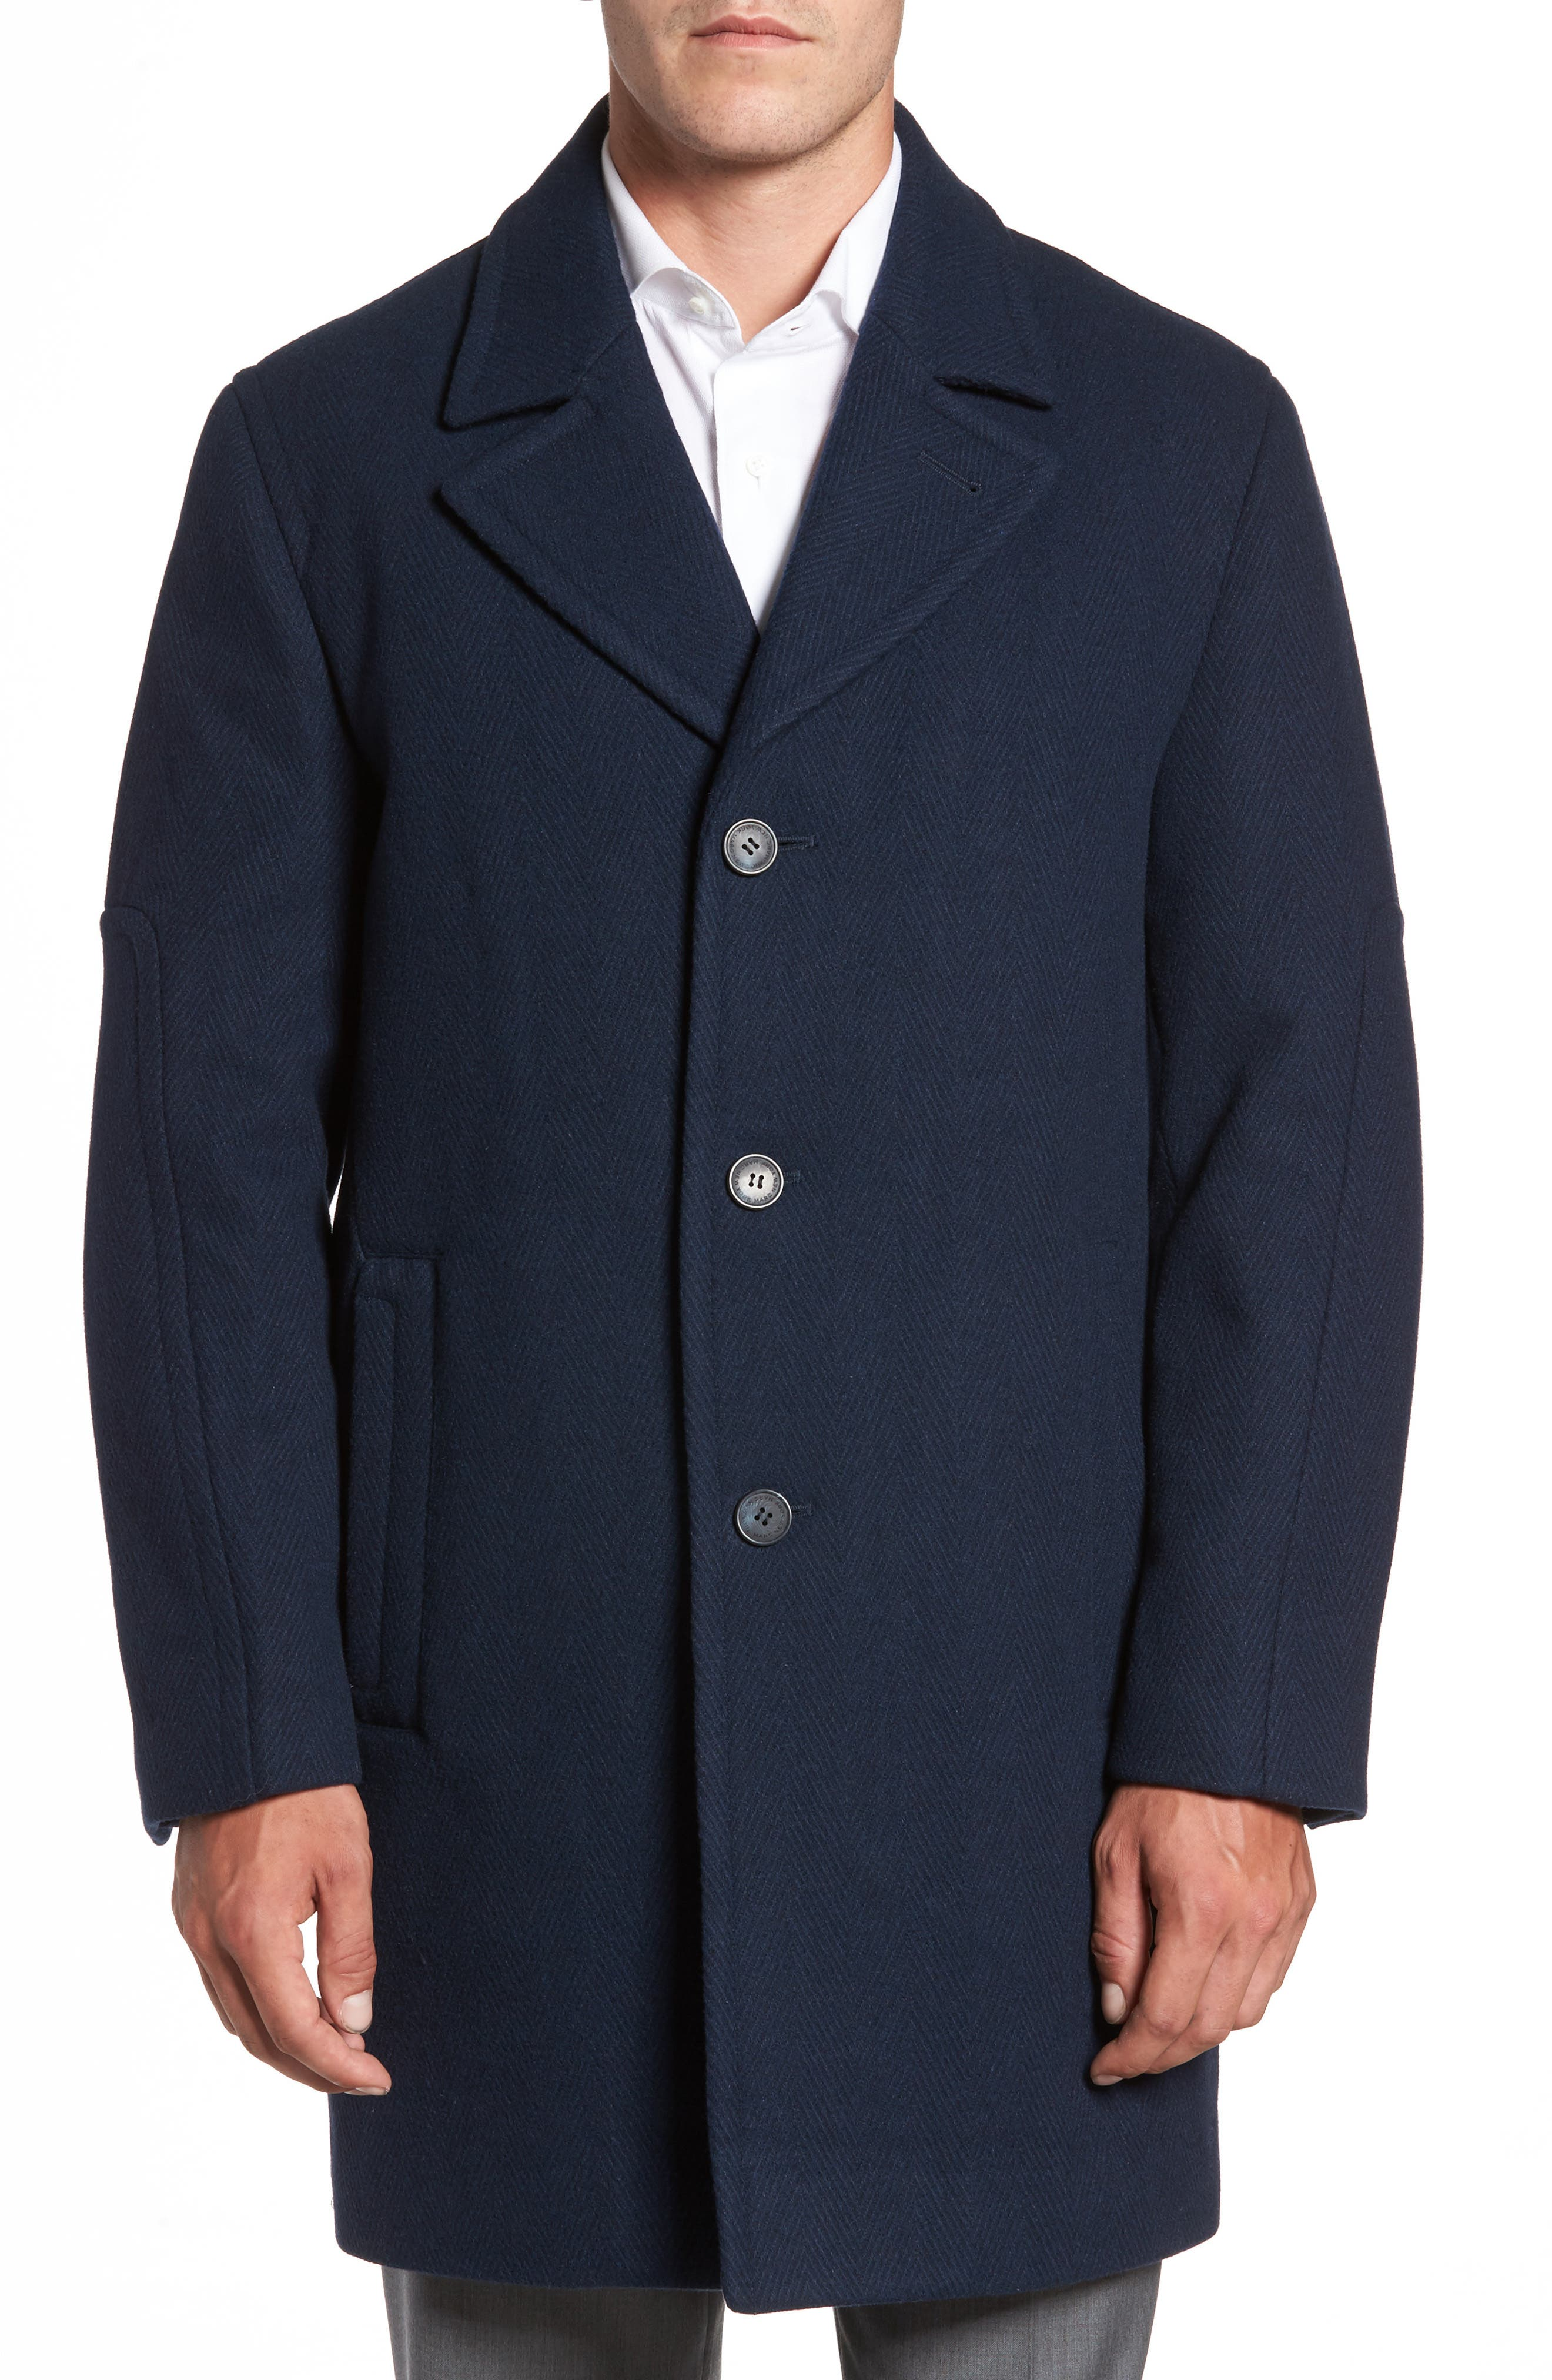 Main Image - Marc New York Herringbone Wool Blend Car Coat